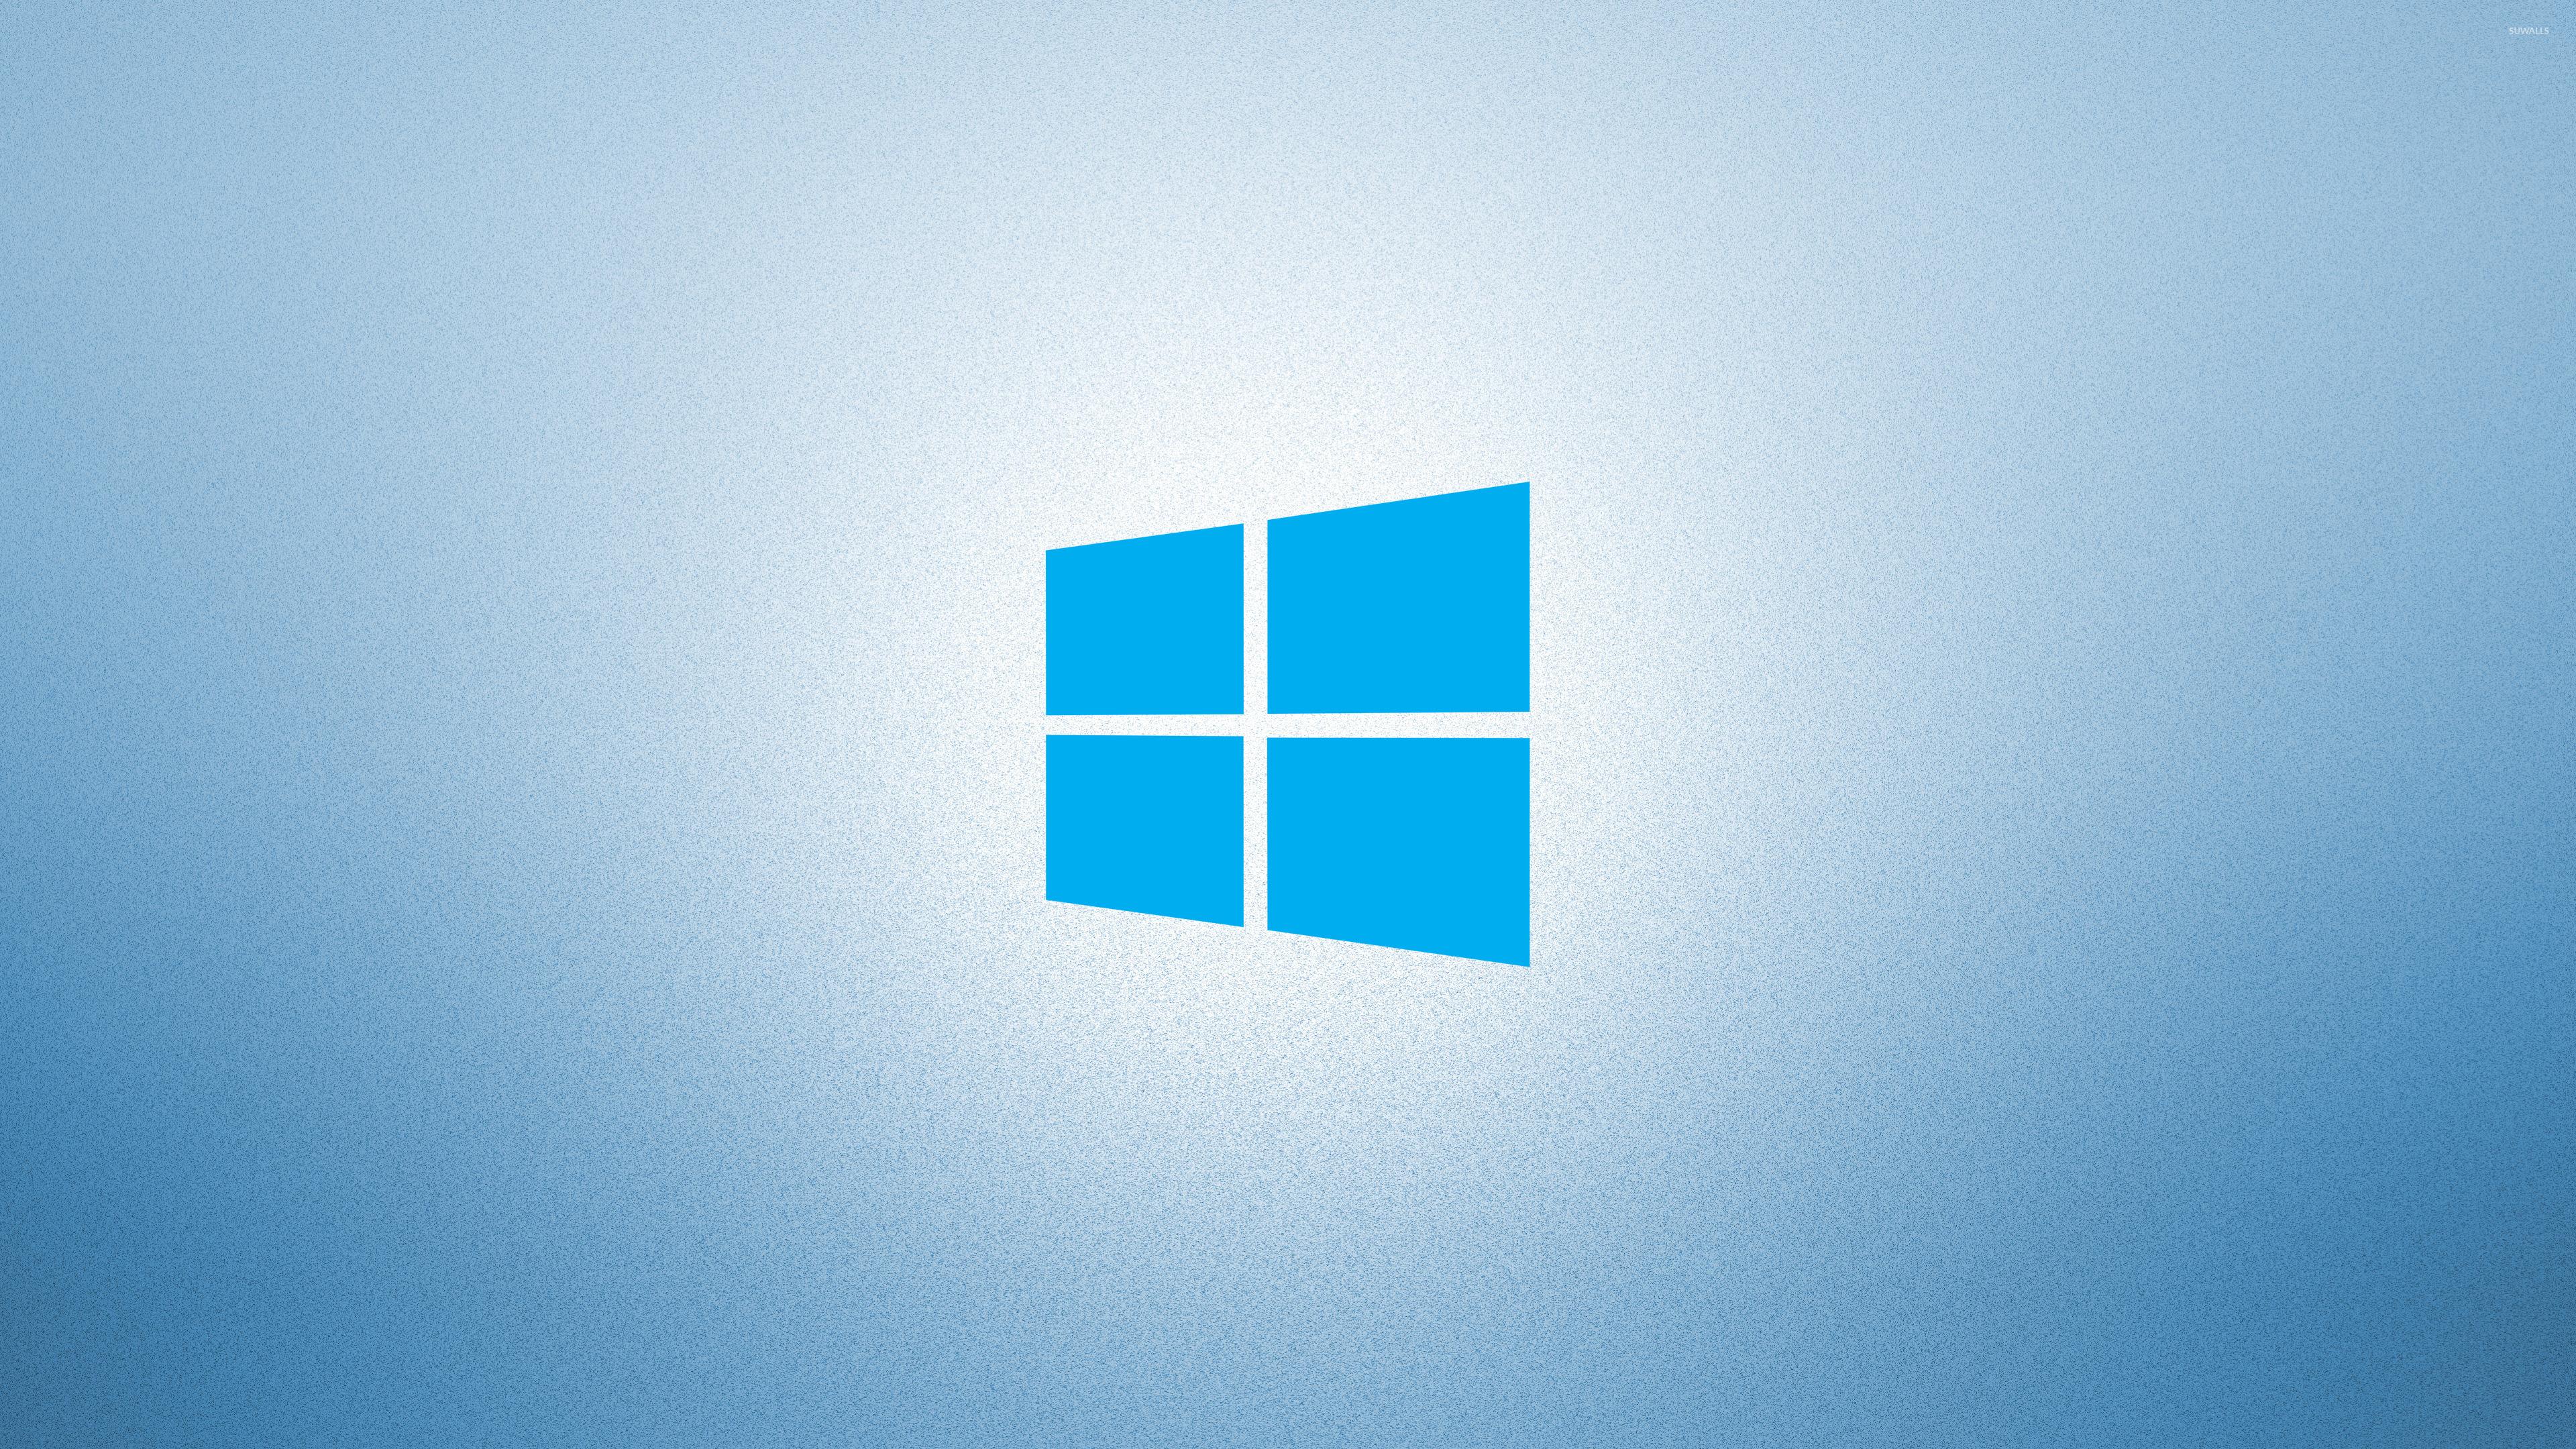 Windows 10 Light Wallpaper - WallpaperSafari